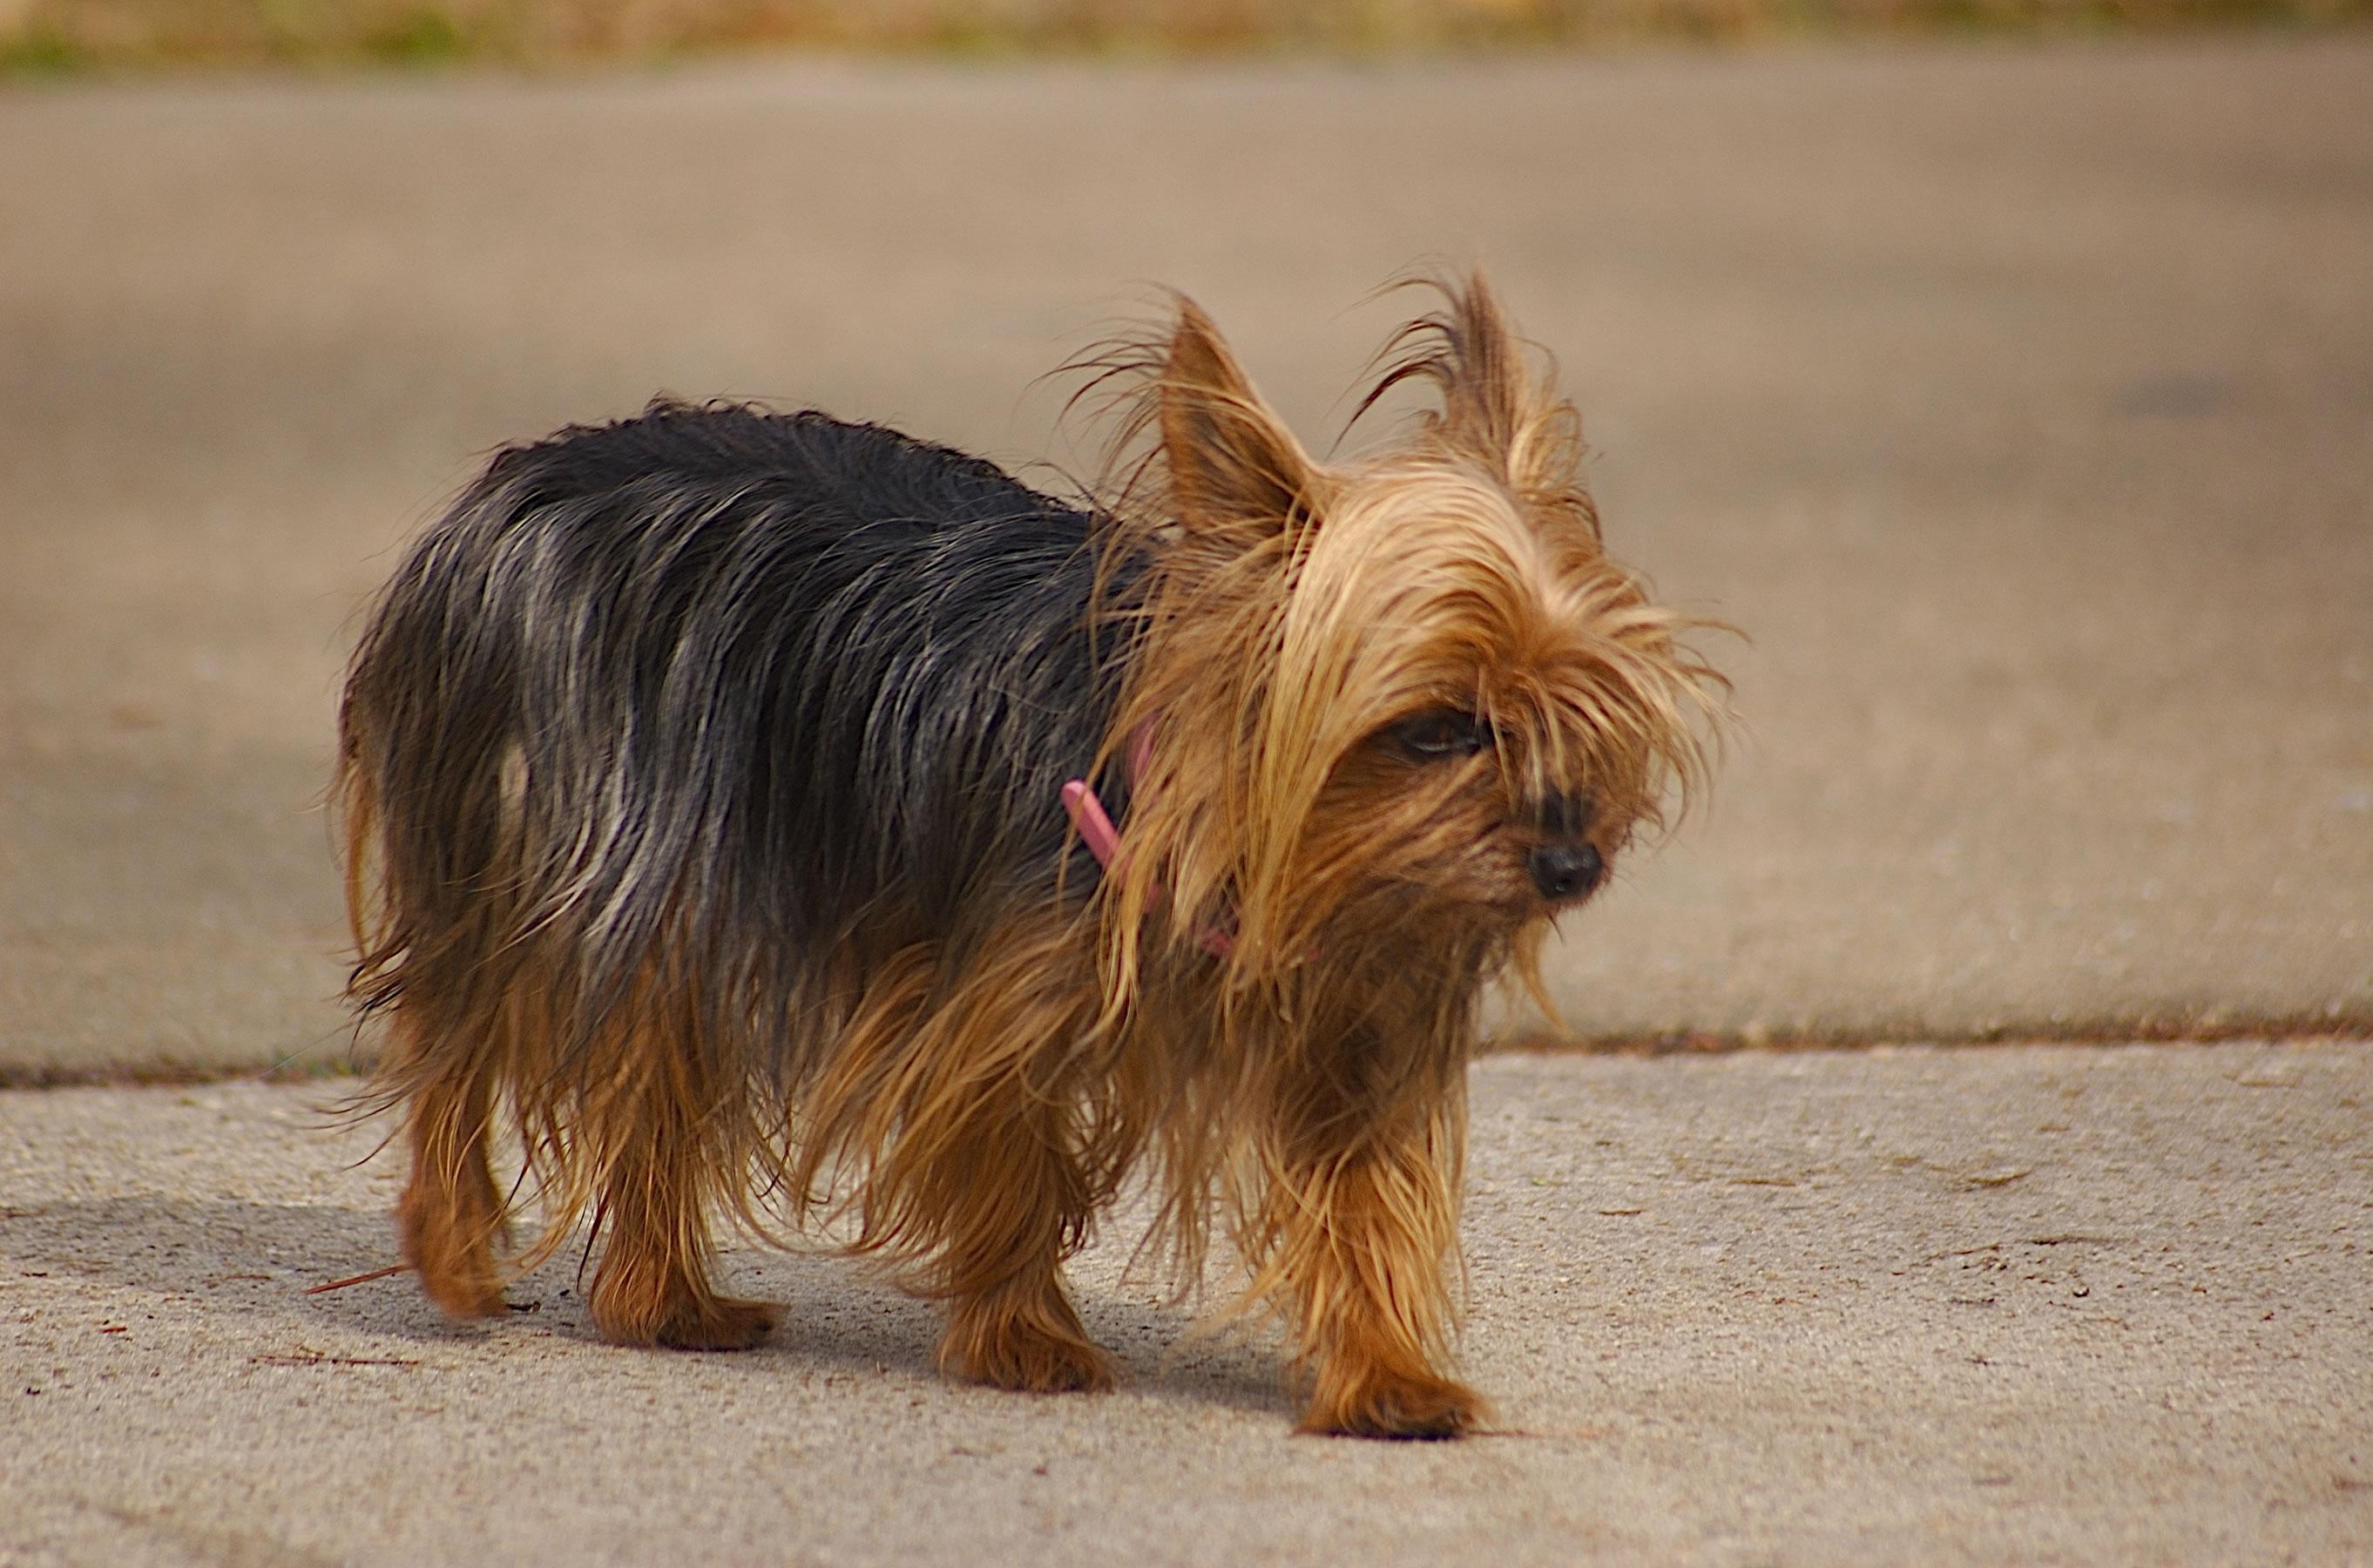 Teacup Yorkshire Terrier - My Doggy Rocks